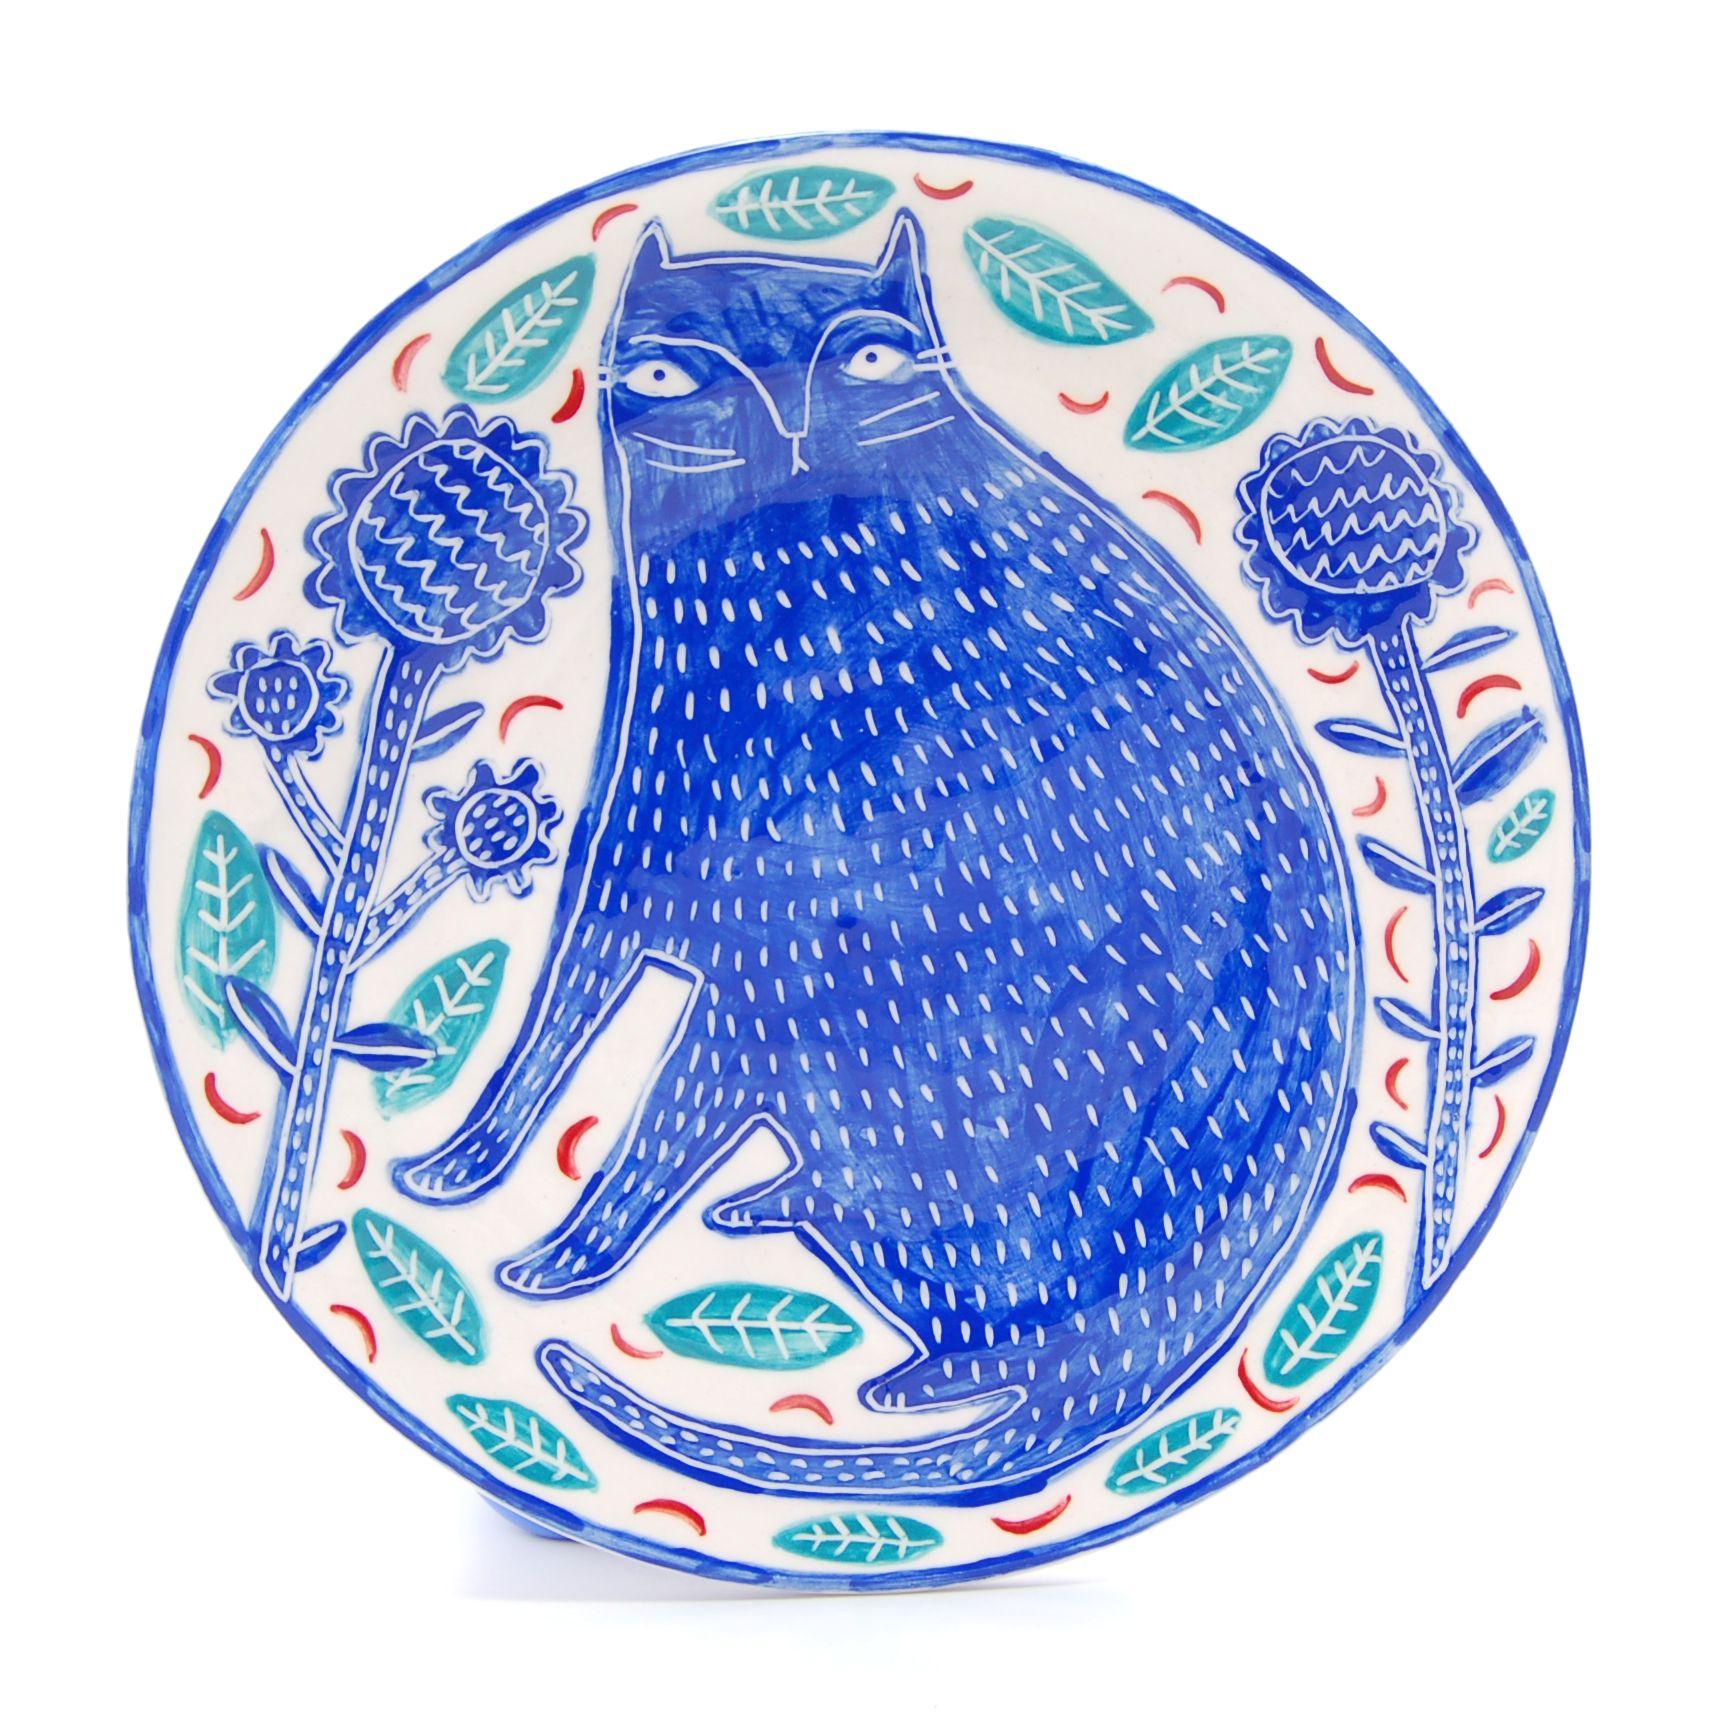 Blue garden cat earthenware plate by Vicky lindo.  www.vickylindo.co.uk